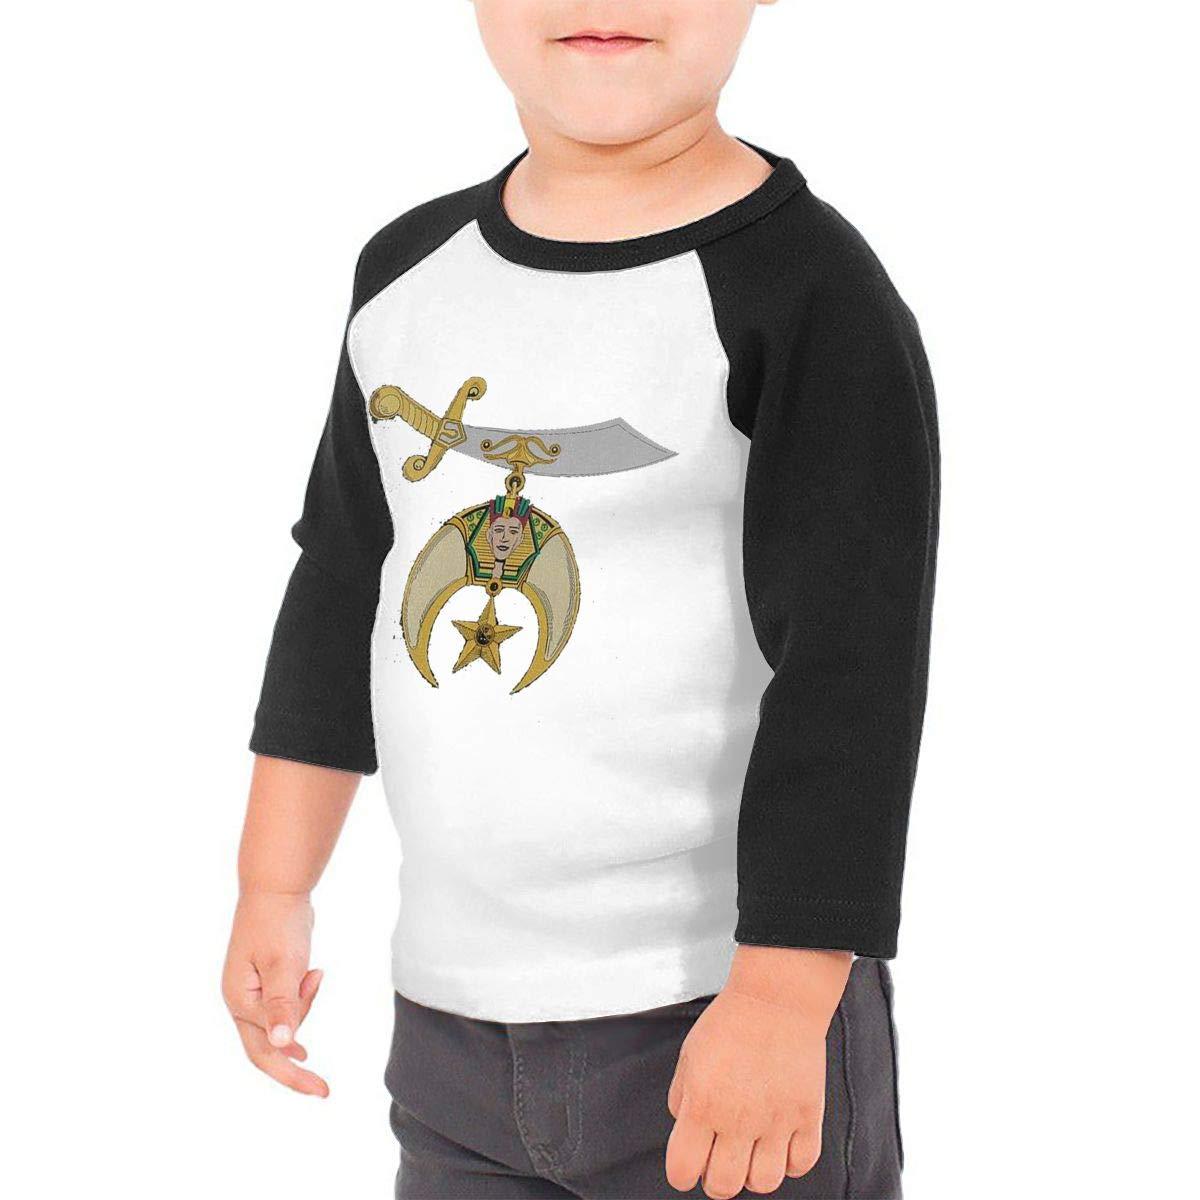 Yimo Crali Shriner Unisex Toddler Baseball Jersey Contrast 3//4 Sleeves Tee